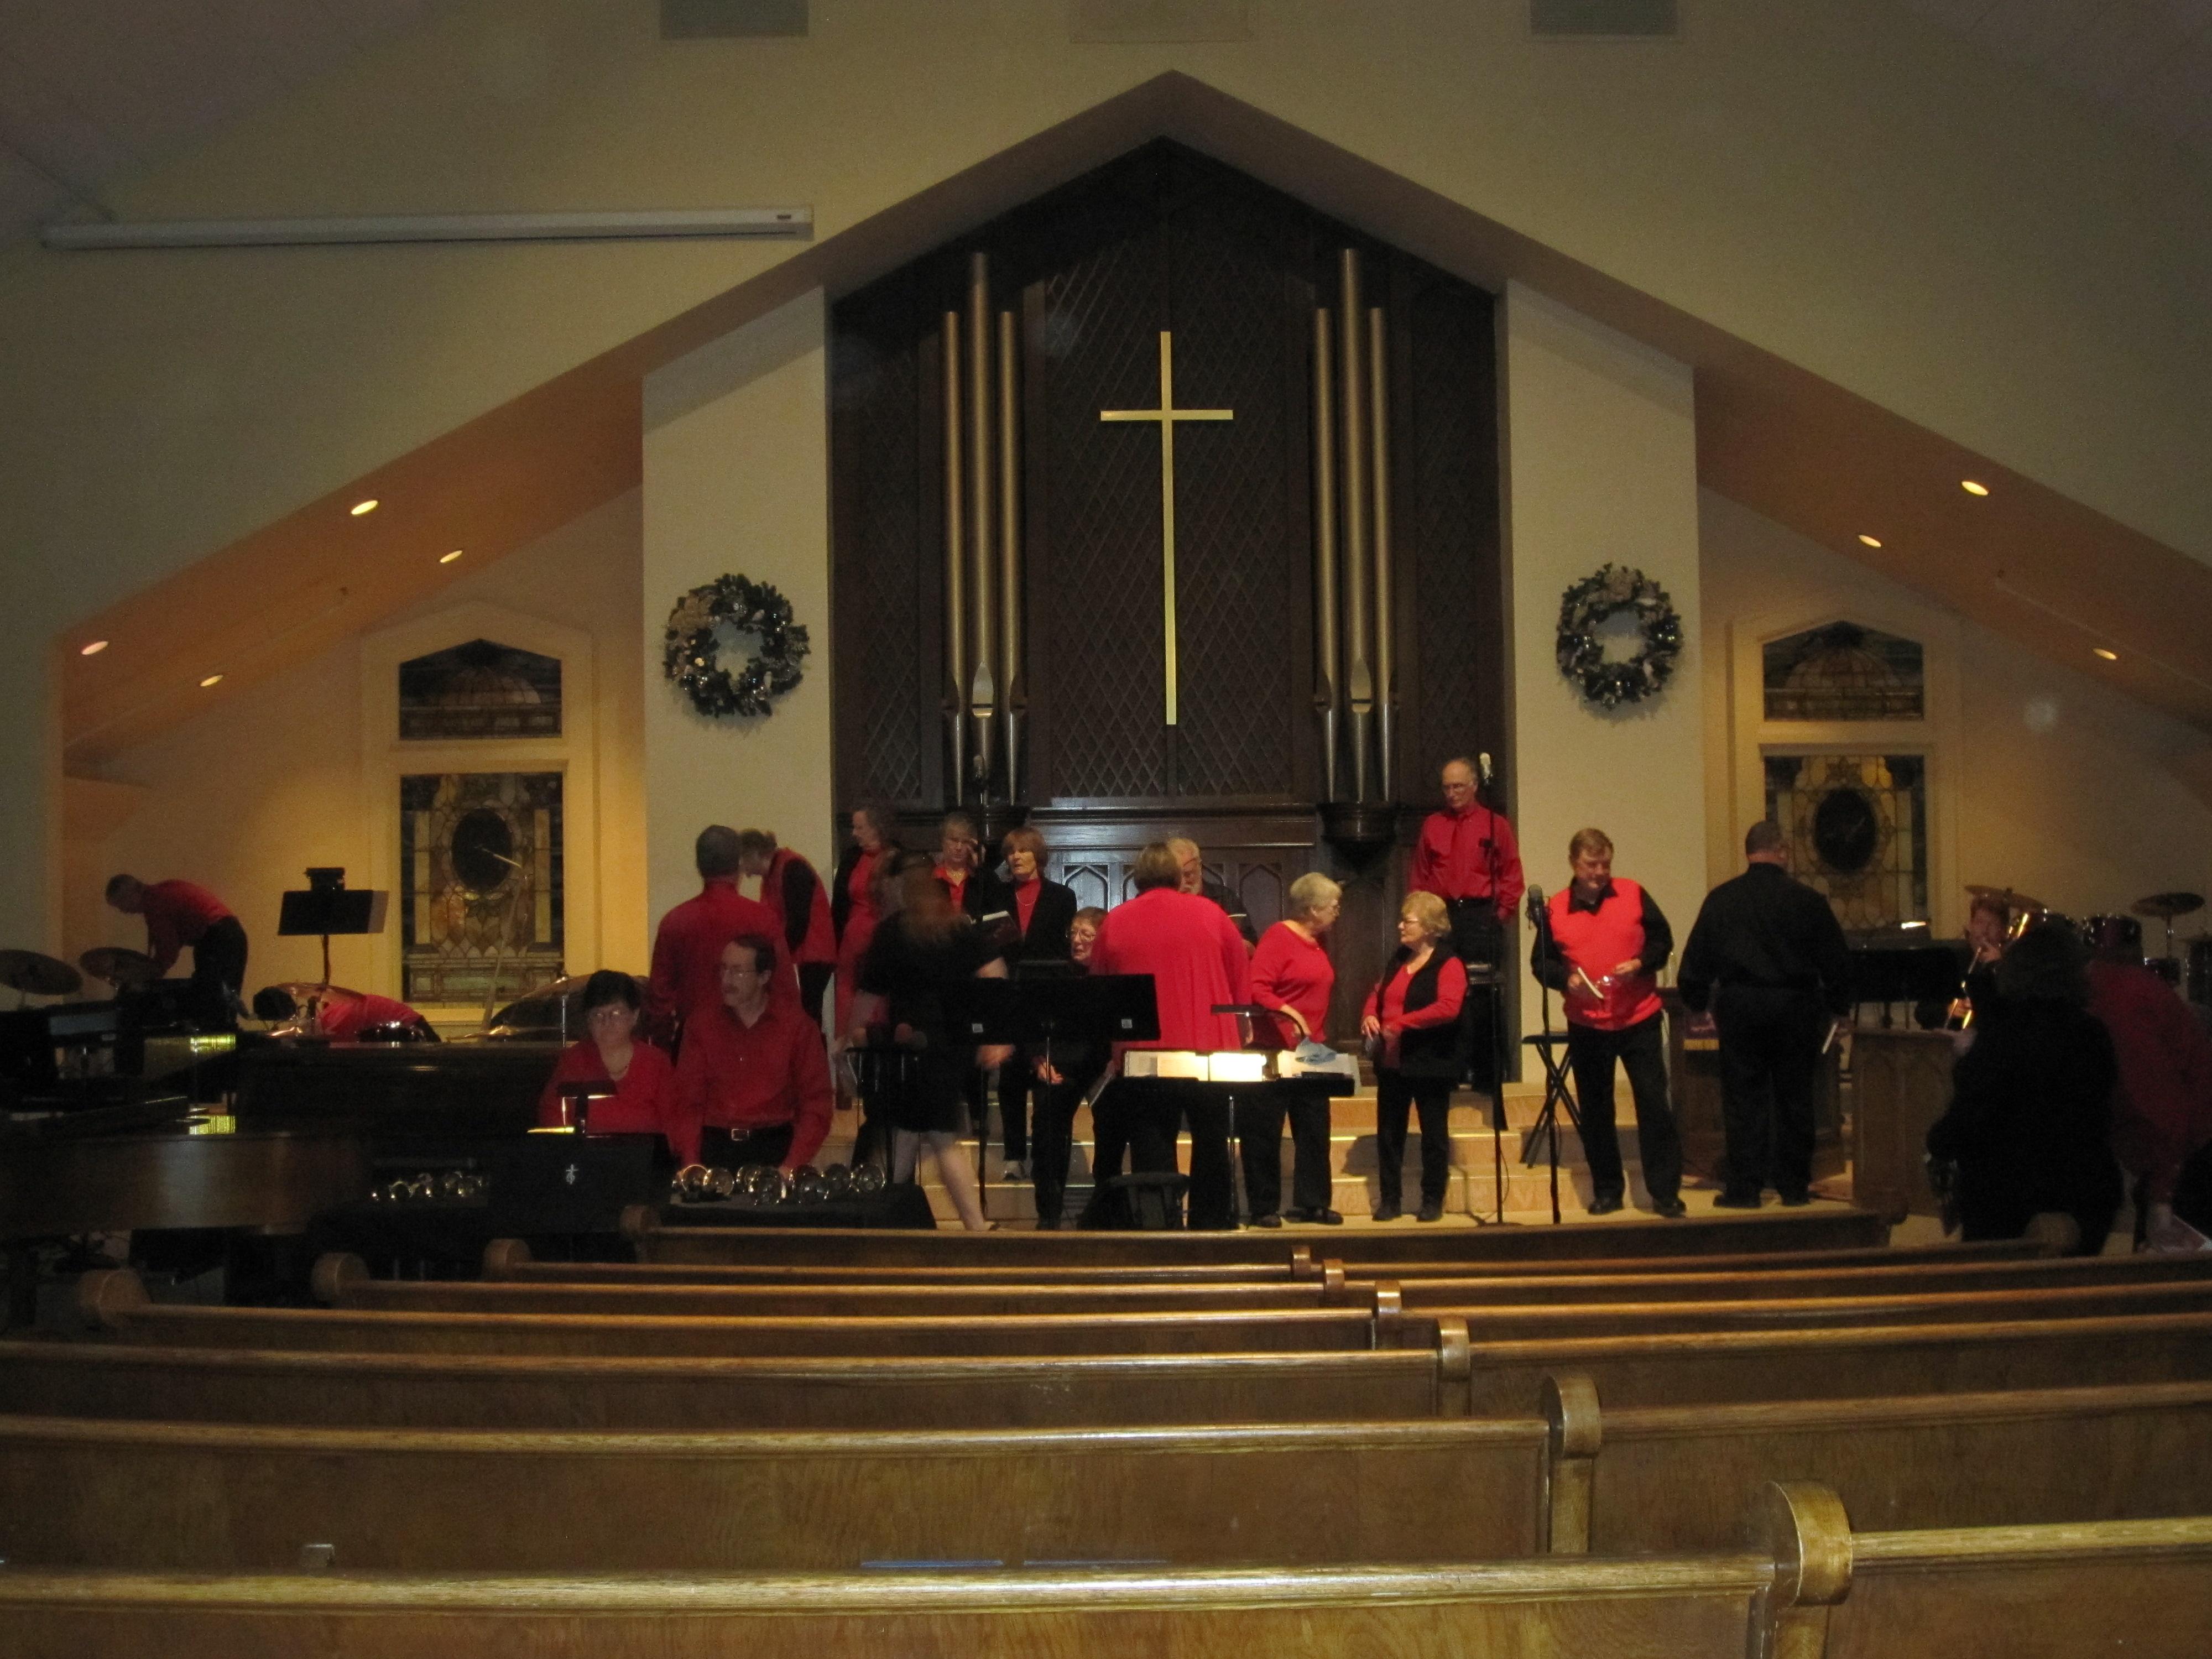 Set up at !st Presbyterian